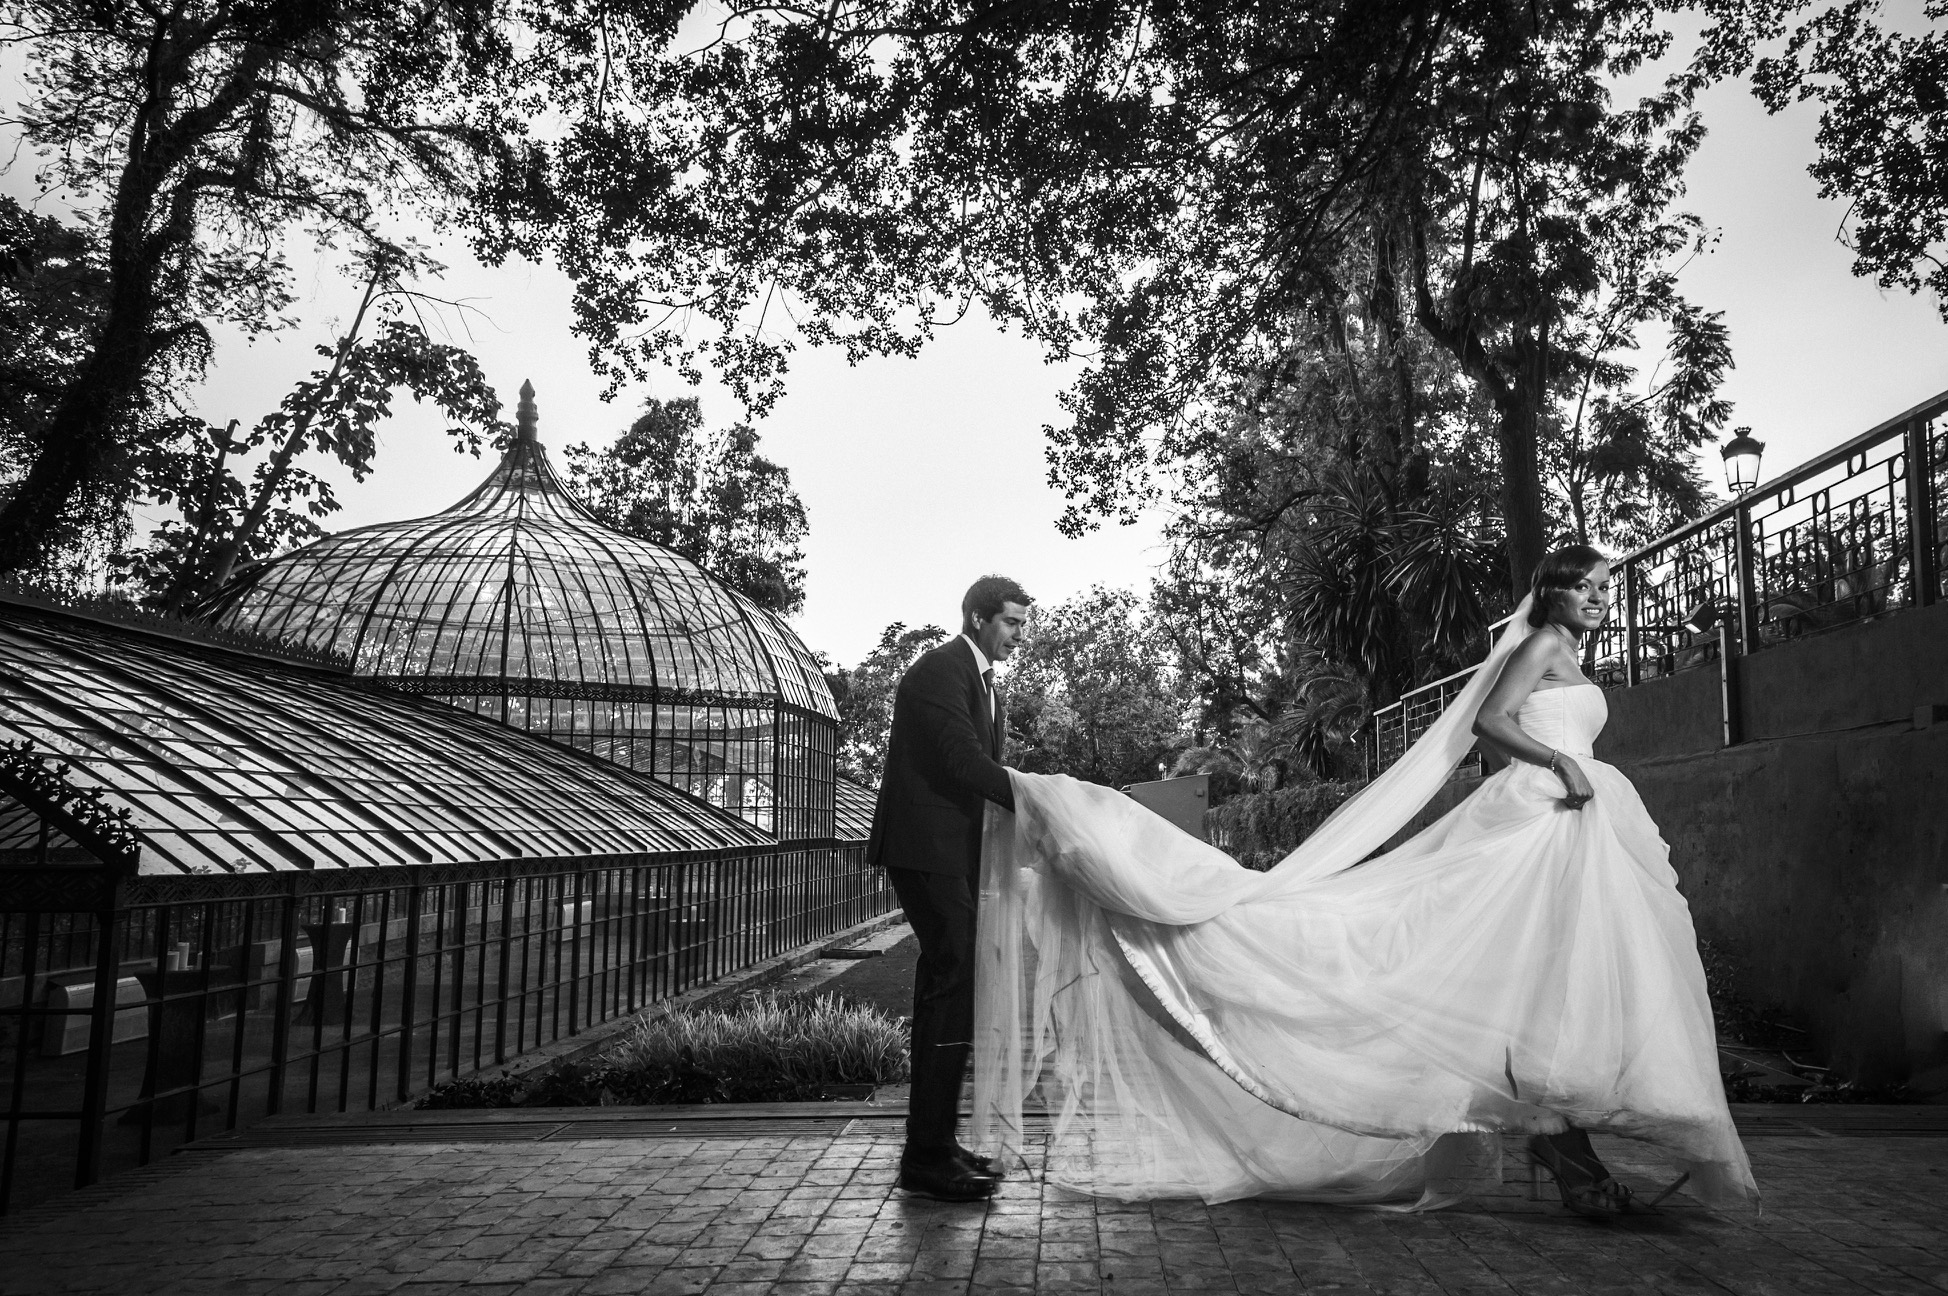 Si-Quiero-Wedding-Planner-By-Sira-Antequera-Virginia-Jose-17